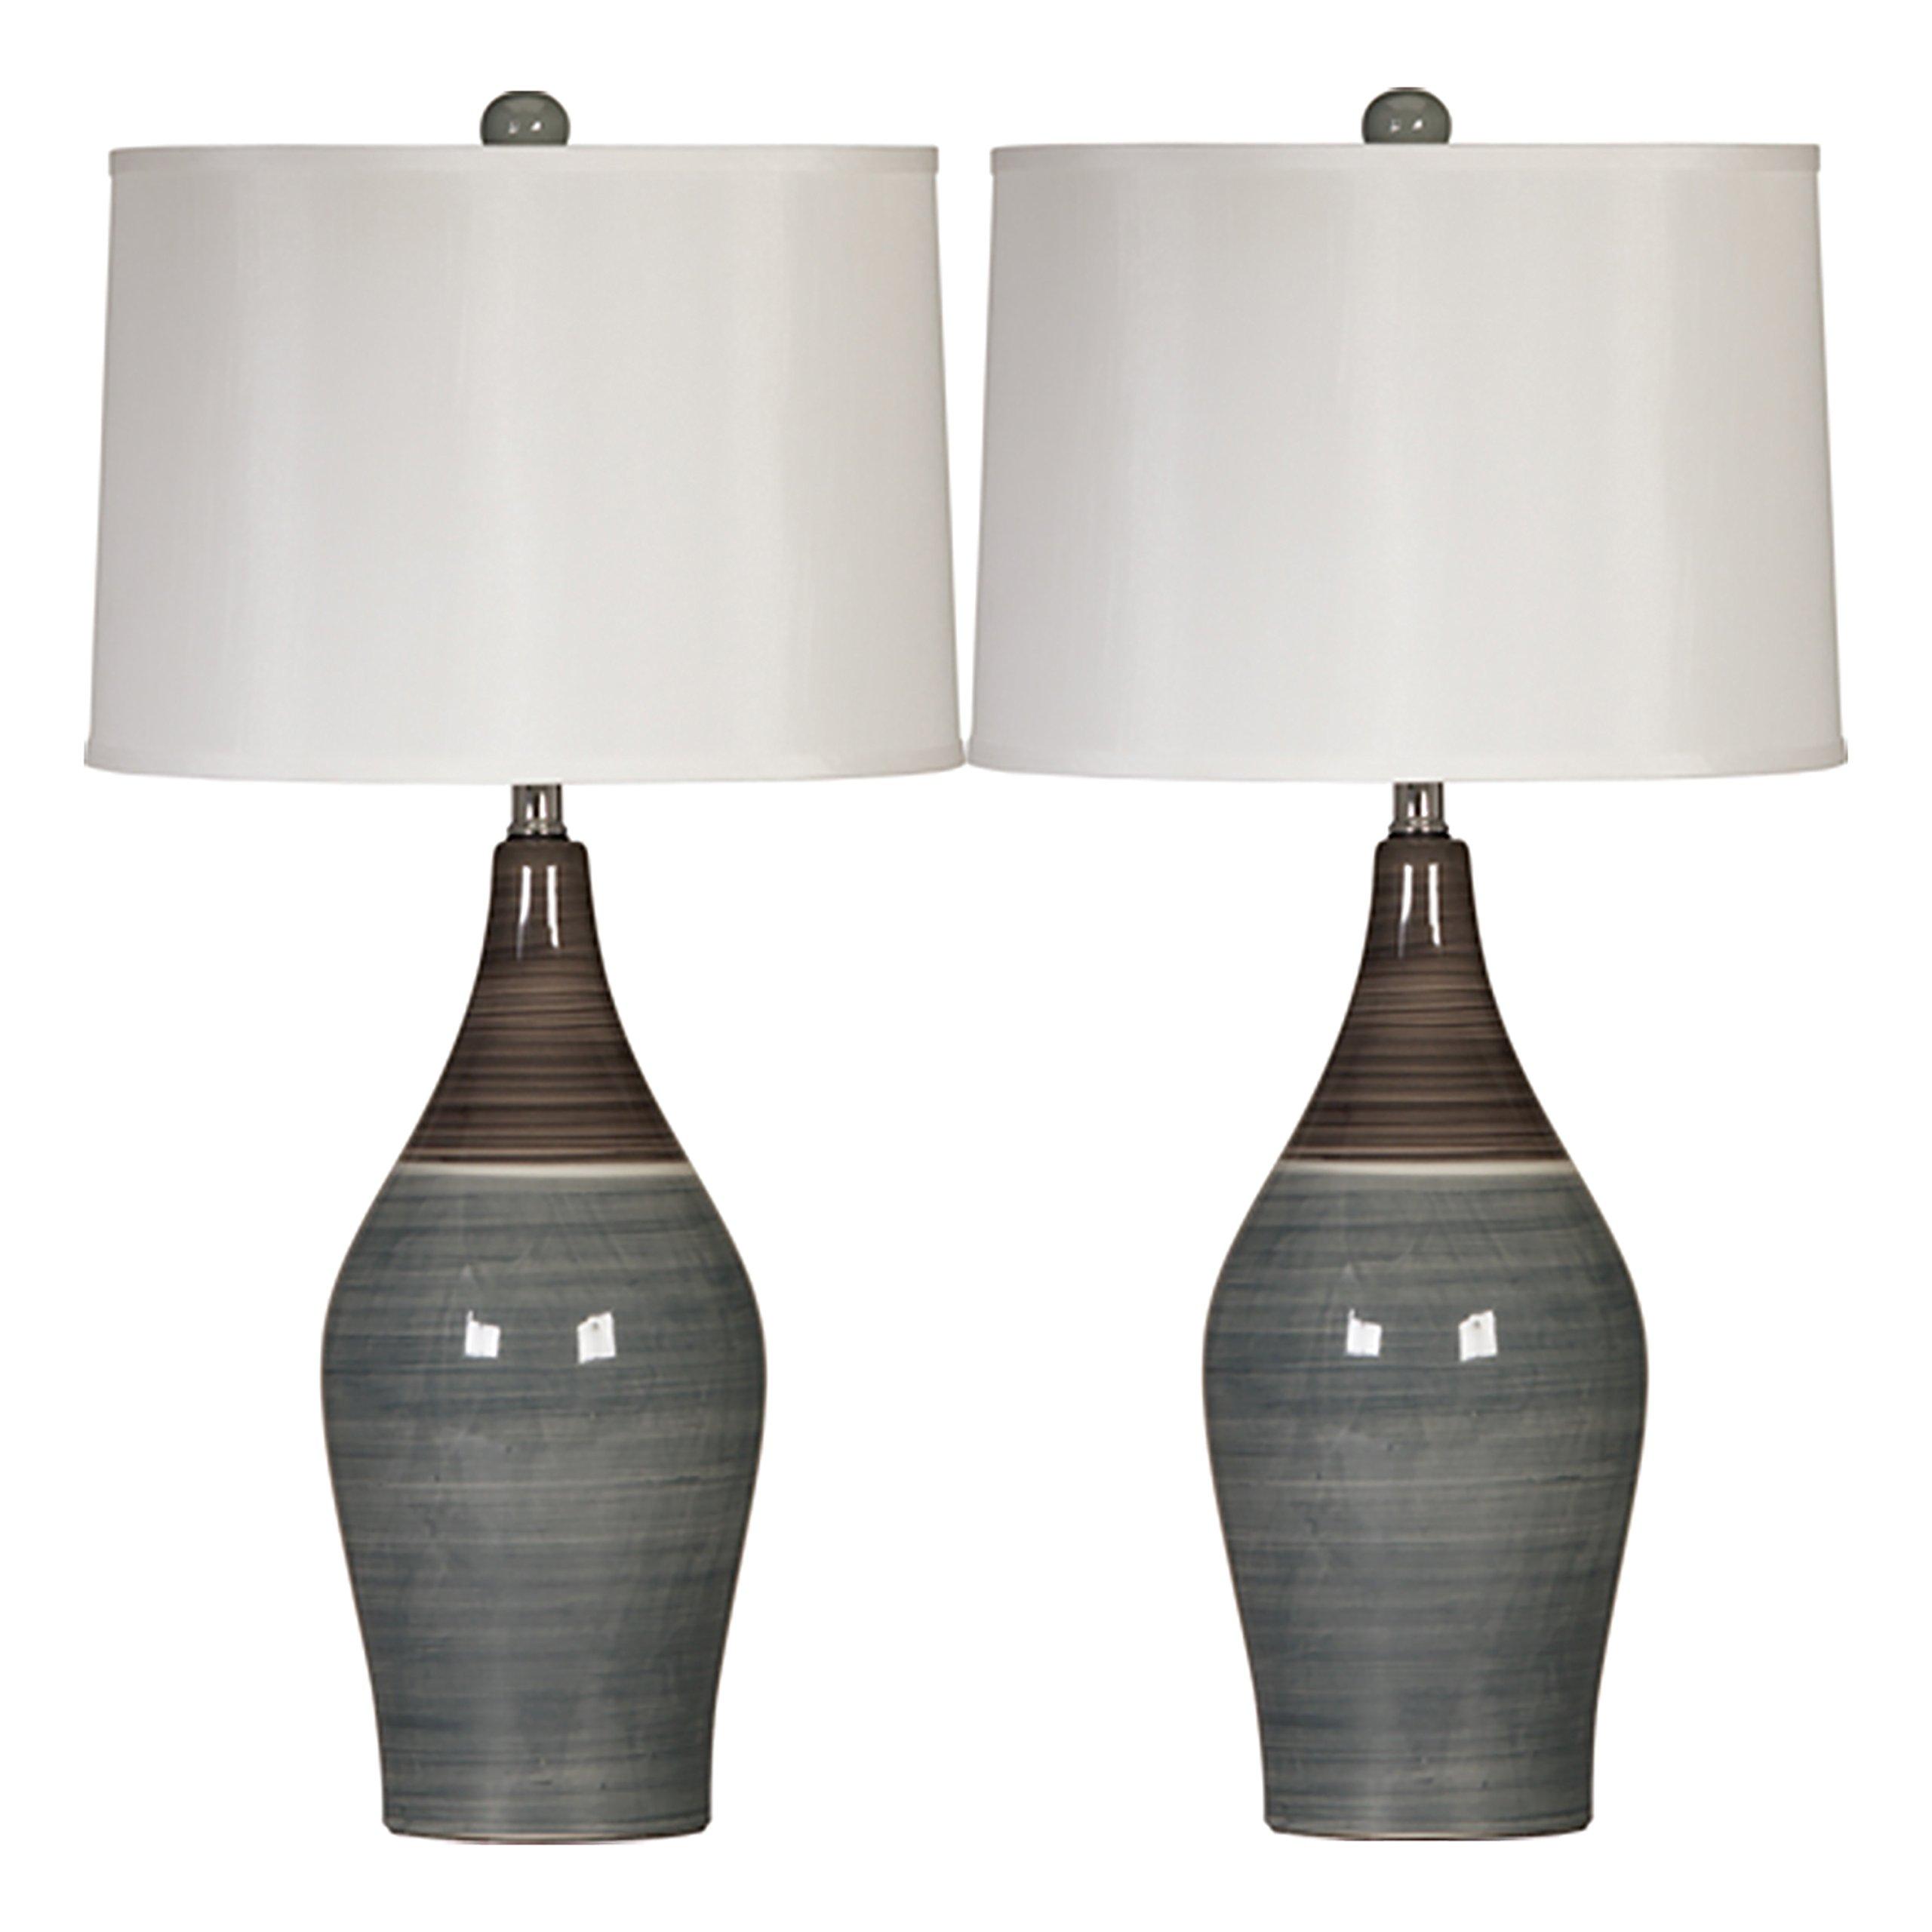 Ashley Furniture Signature Design -  Niobe Ceramic Table Lamp - Set of 2 - Multicolored/Gray